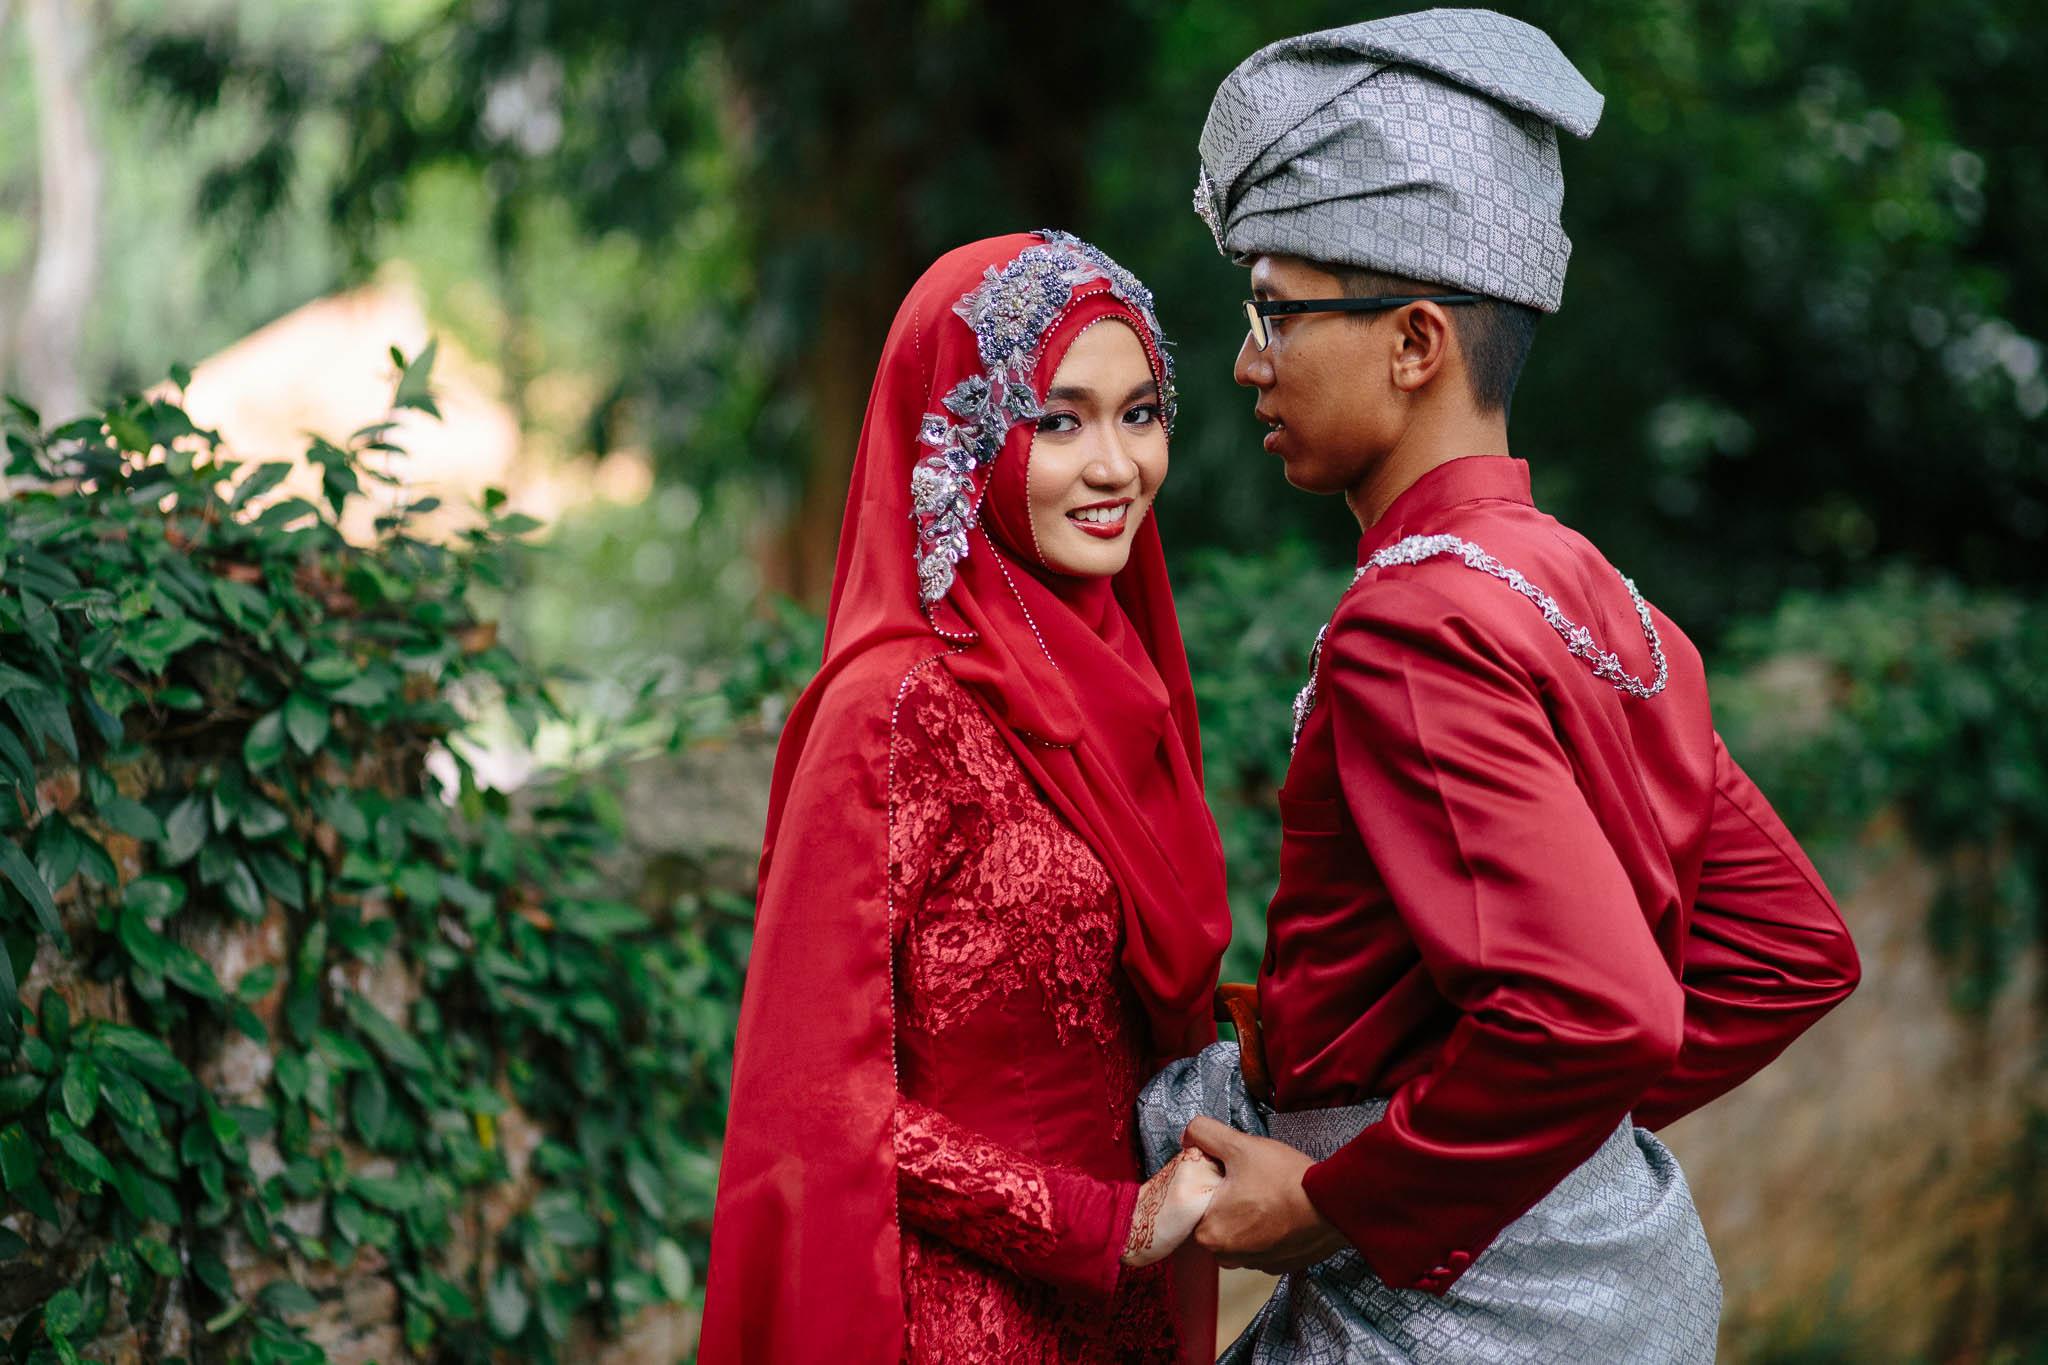 singapore-wedding-photographer-sharalyn-syazwan-066.jpg